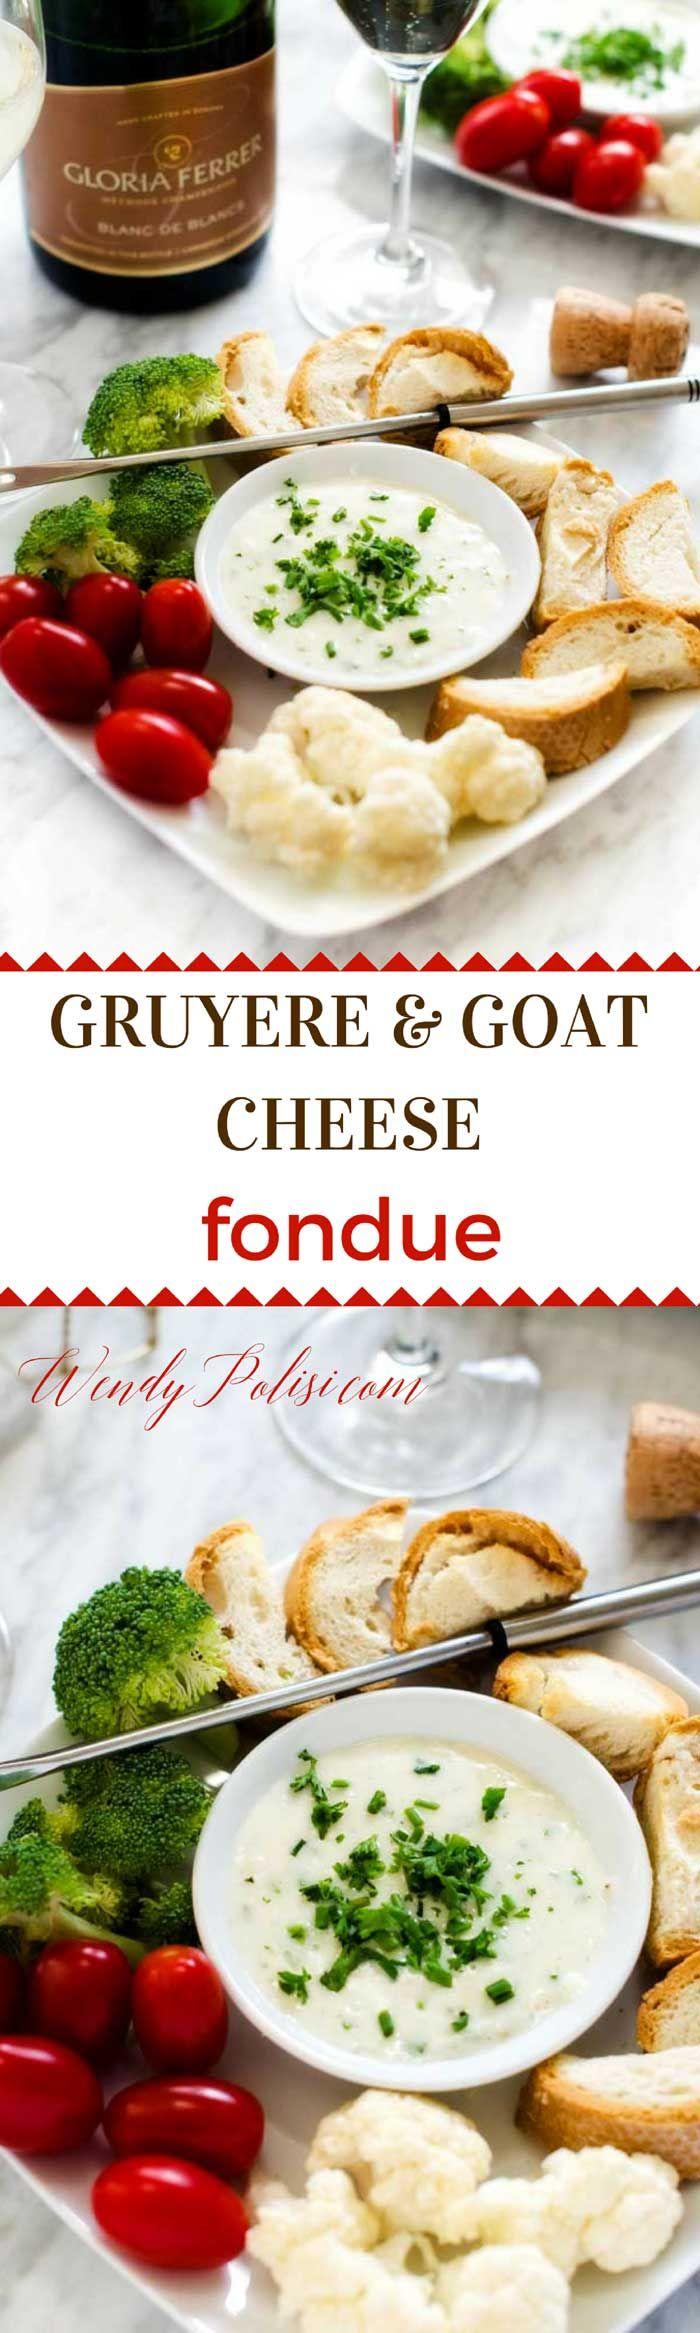 Easy cheese recipe for fondue